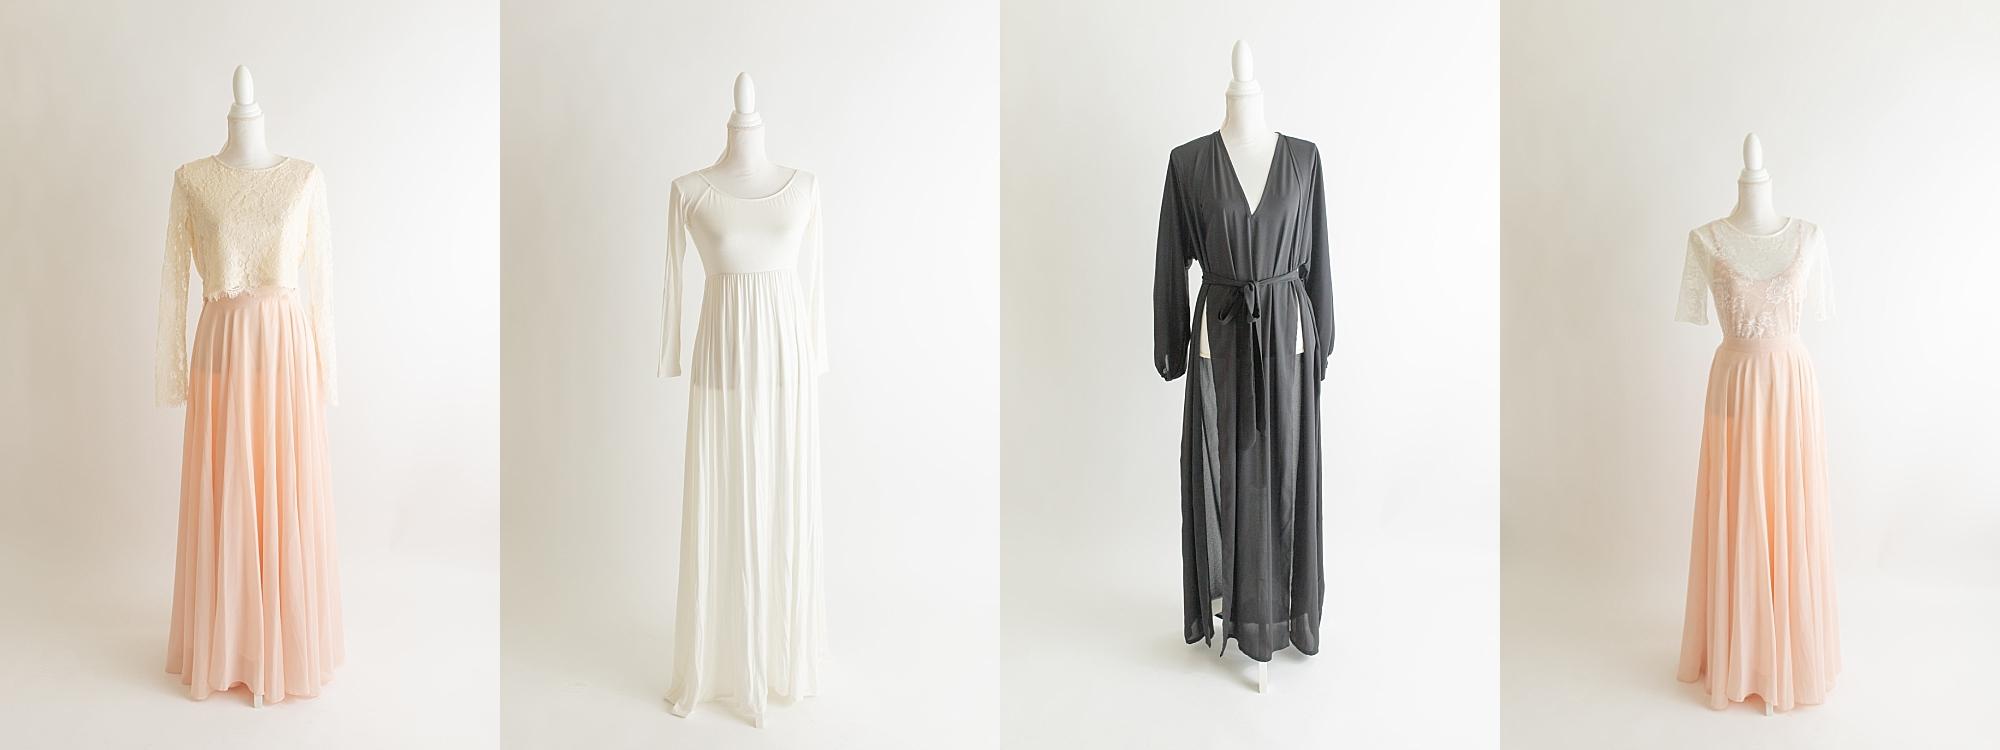 Winter Wardrobe Favorites